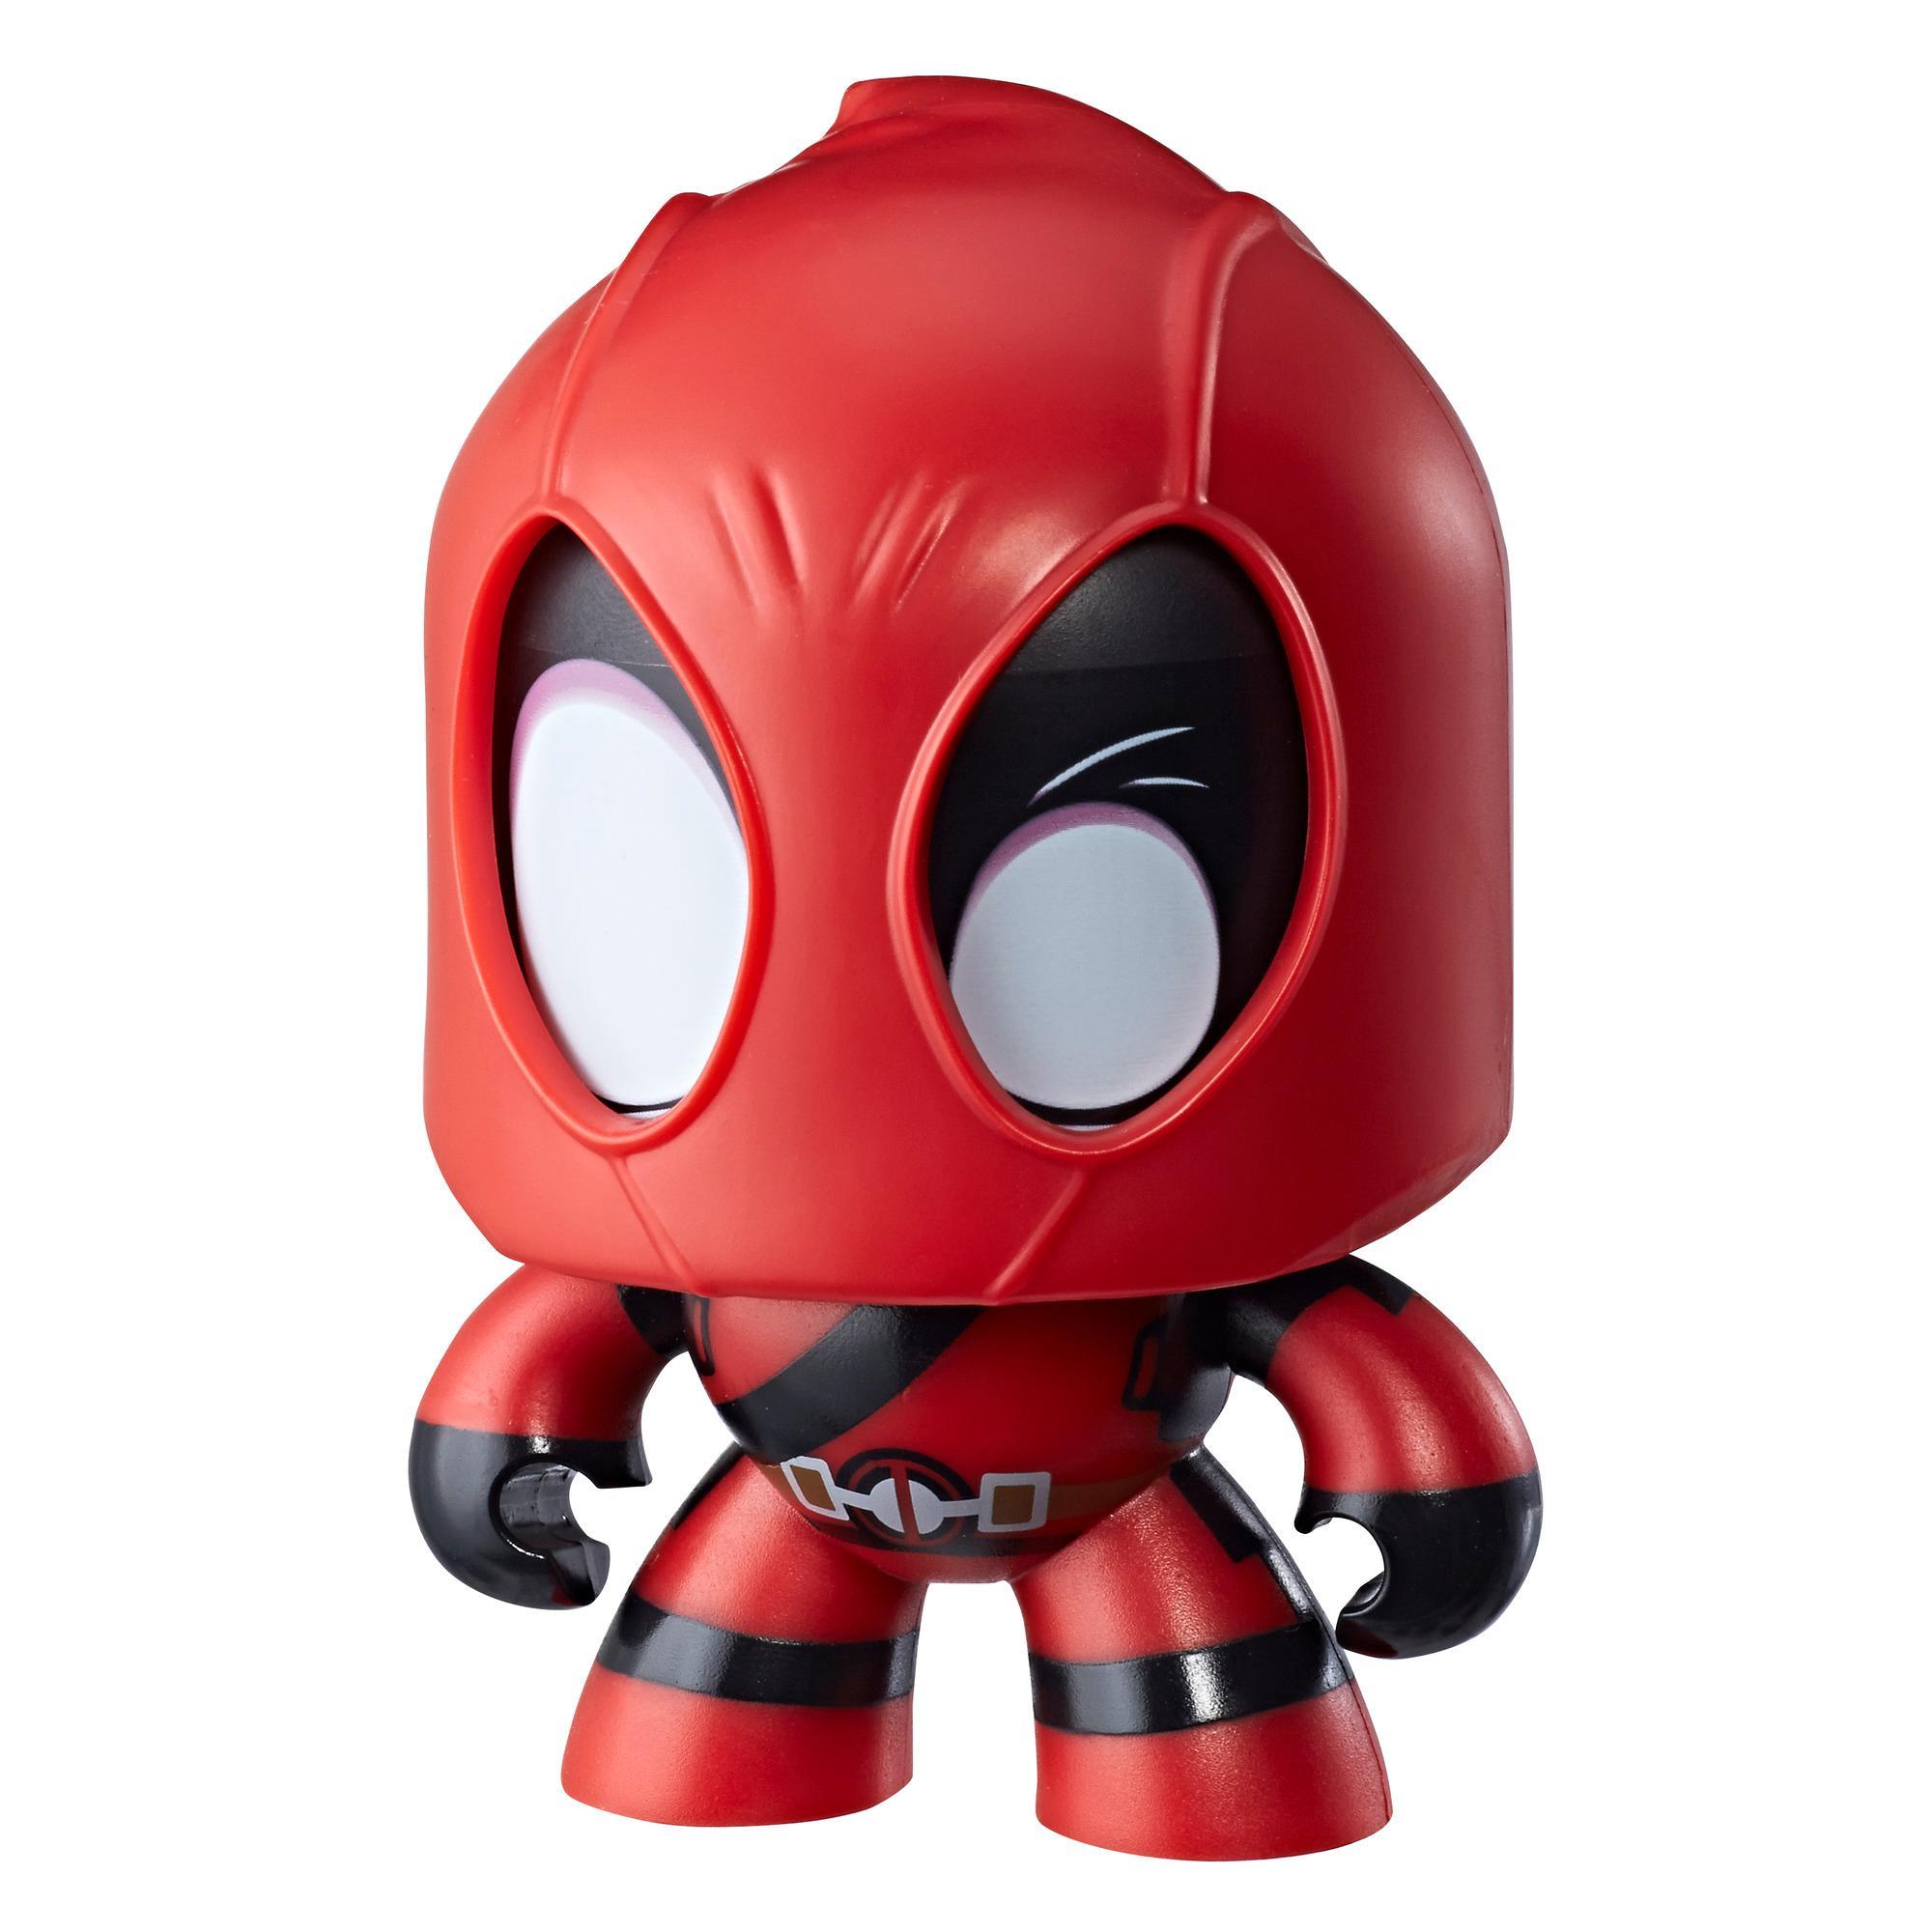 Marvel Classic - Mighty Muggs - Deadpool (E2805)